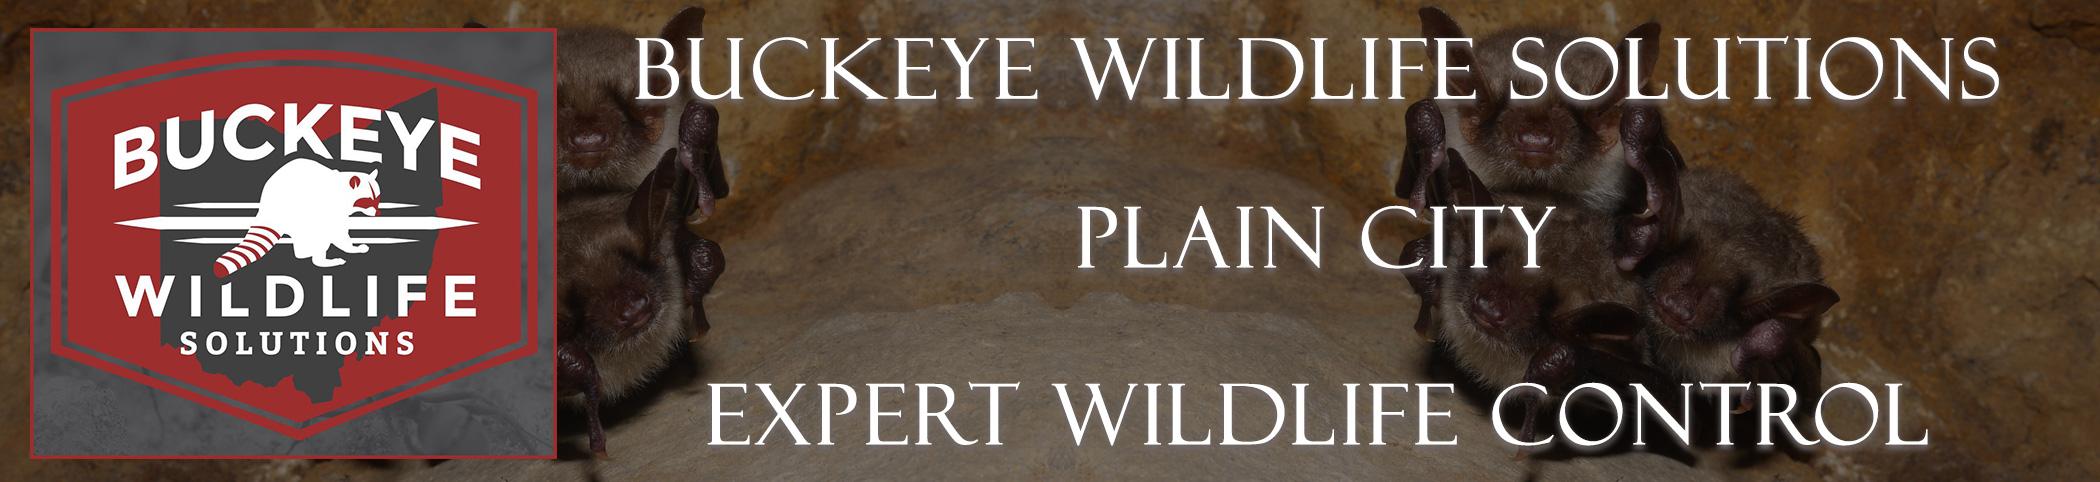 Plain-City-buckeye-wildlife-solutions-ohio-header-image